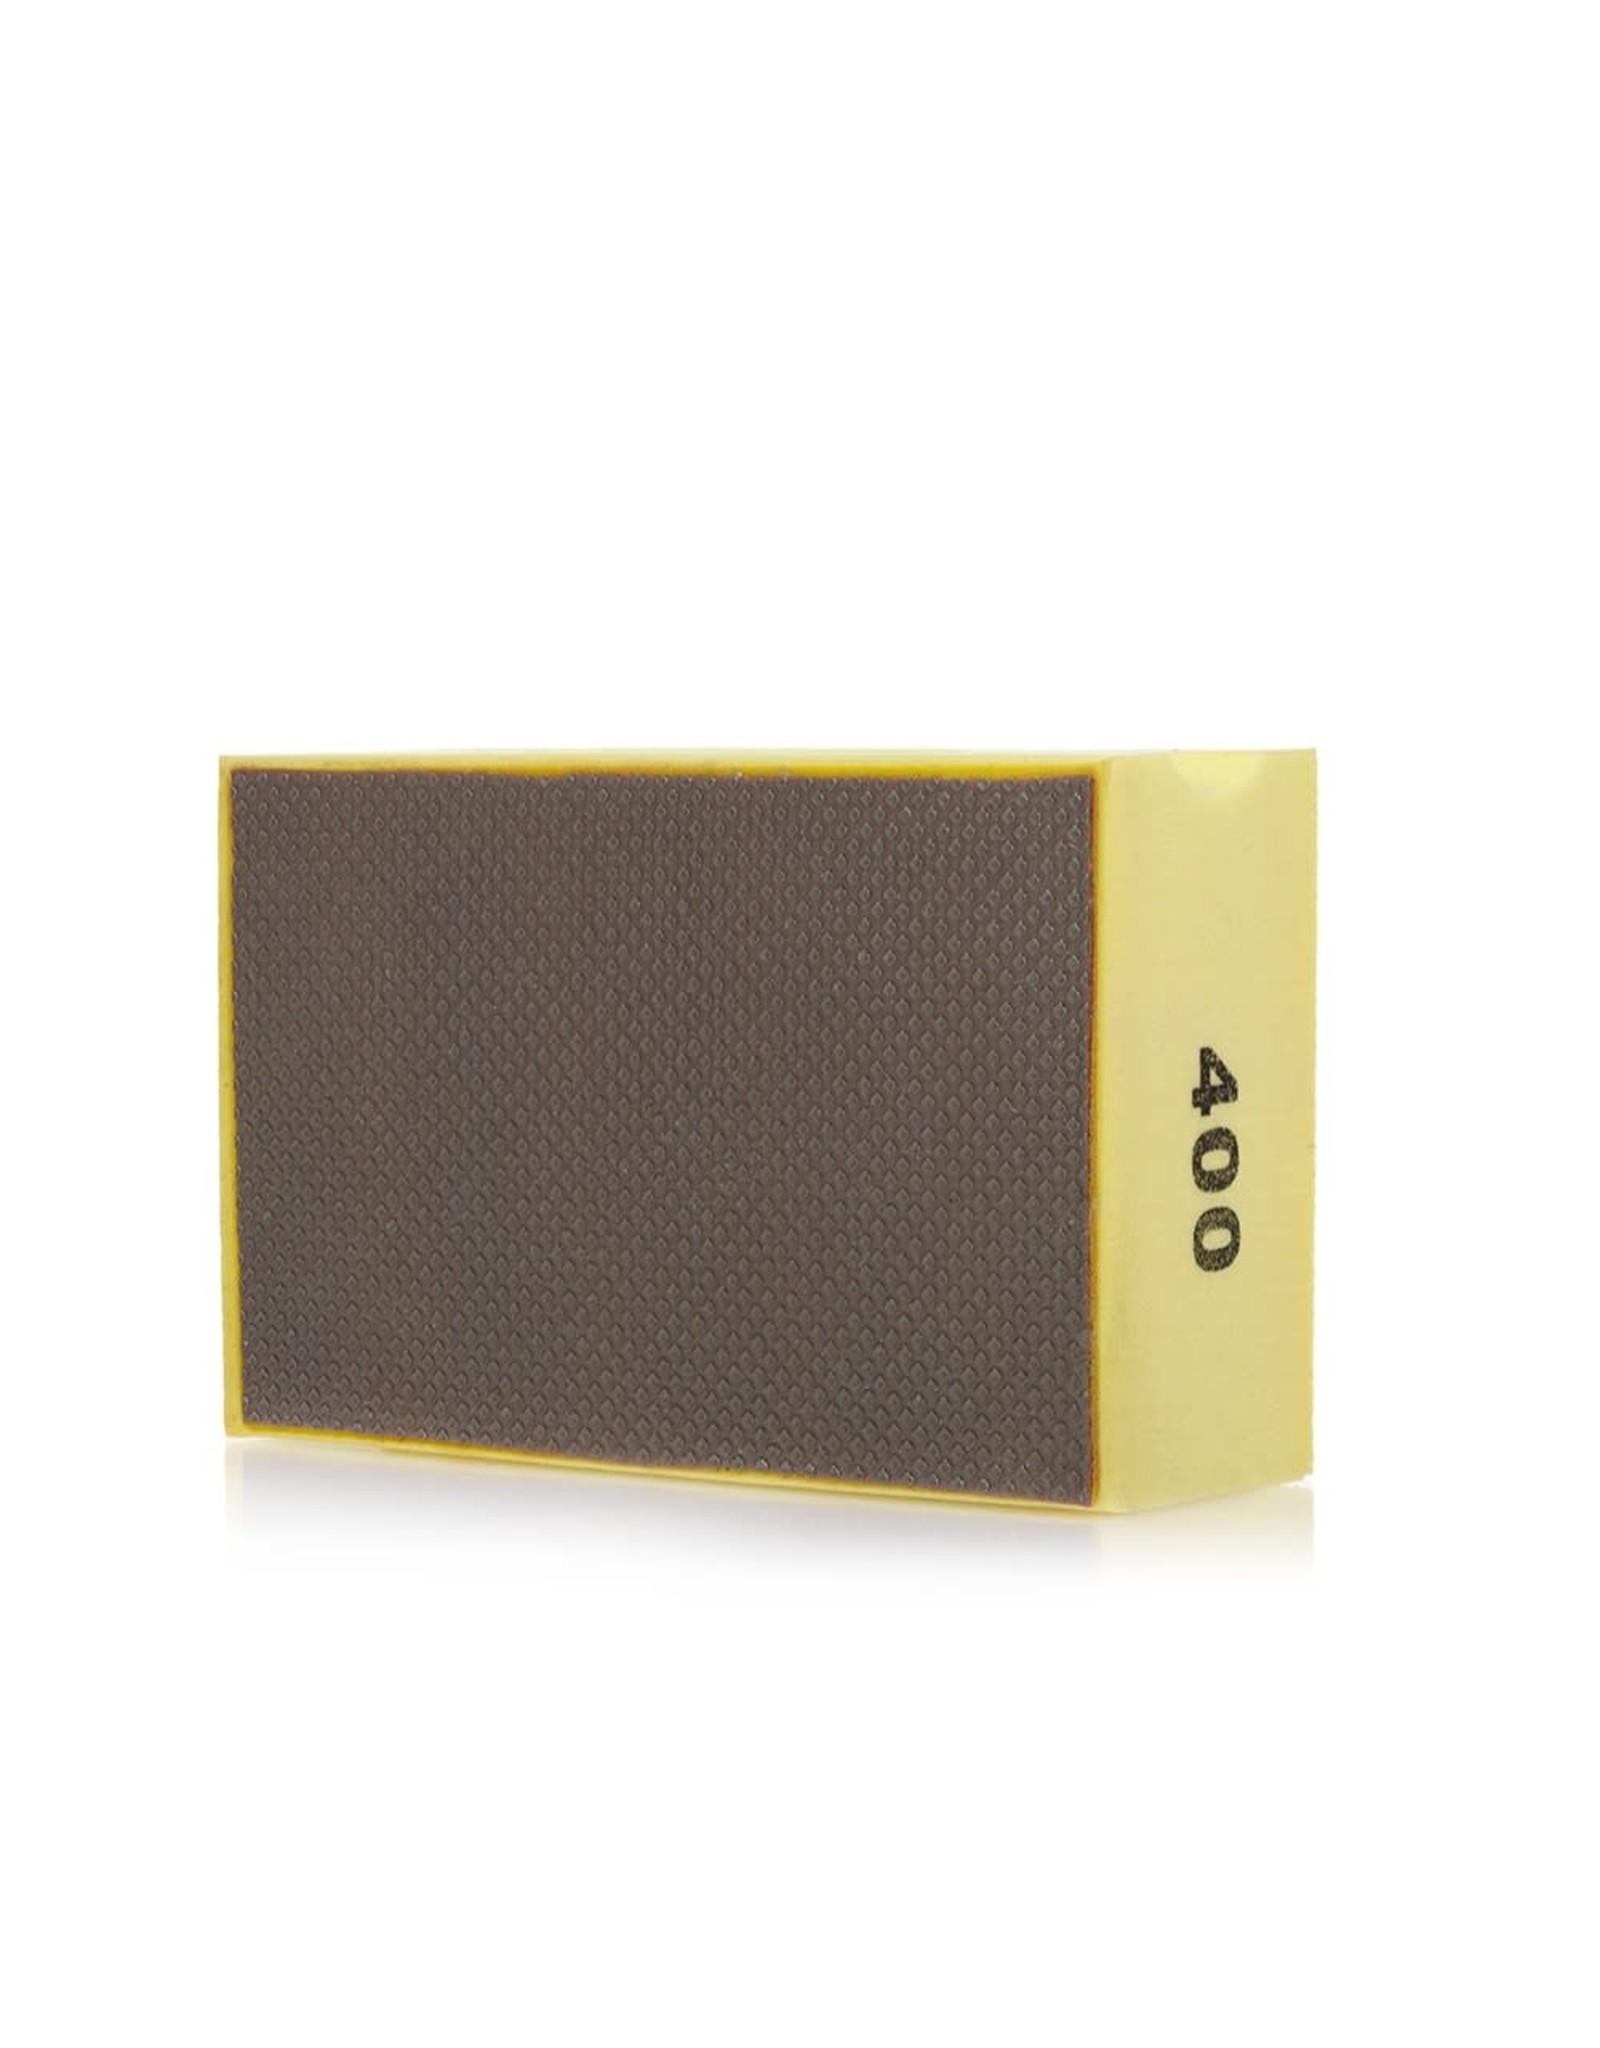 CDK Stone 90x55mm DIAFLEX Yellow 400 Grit Hand Pad